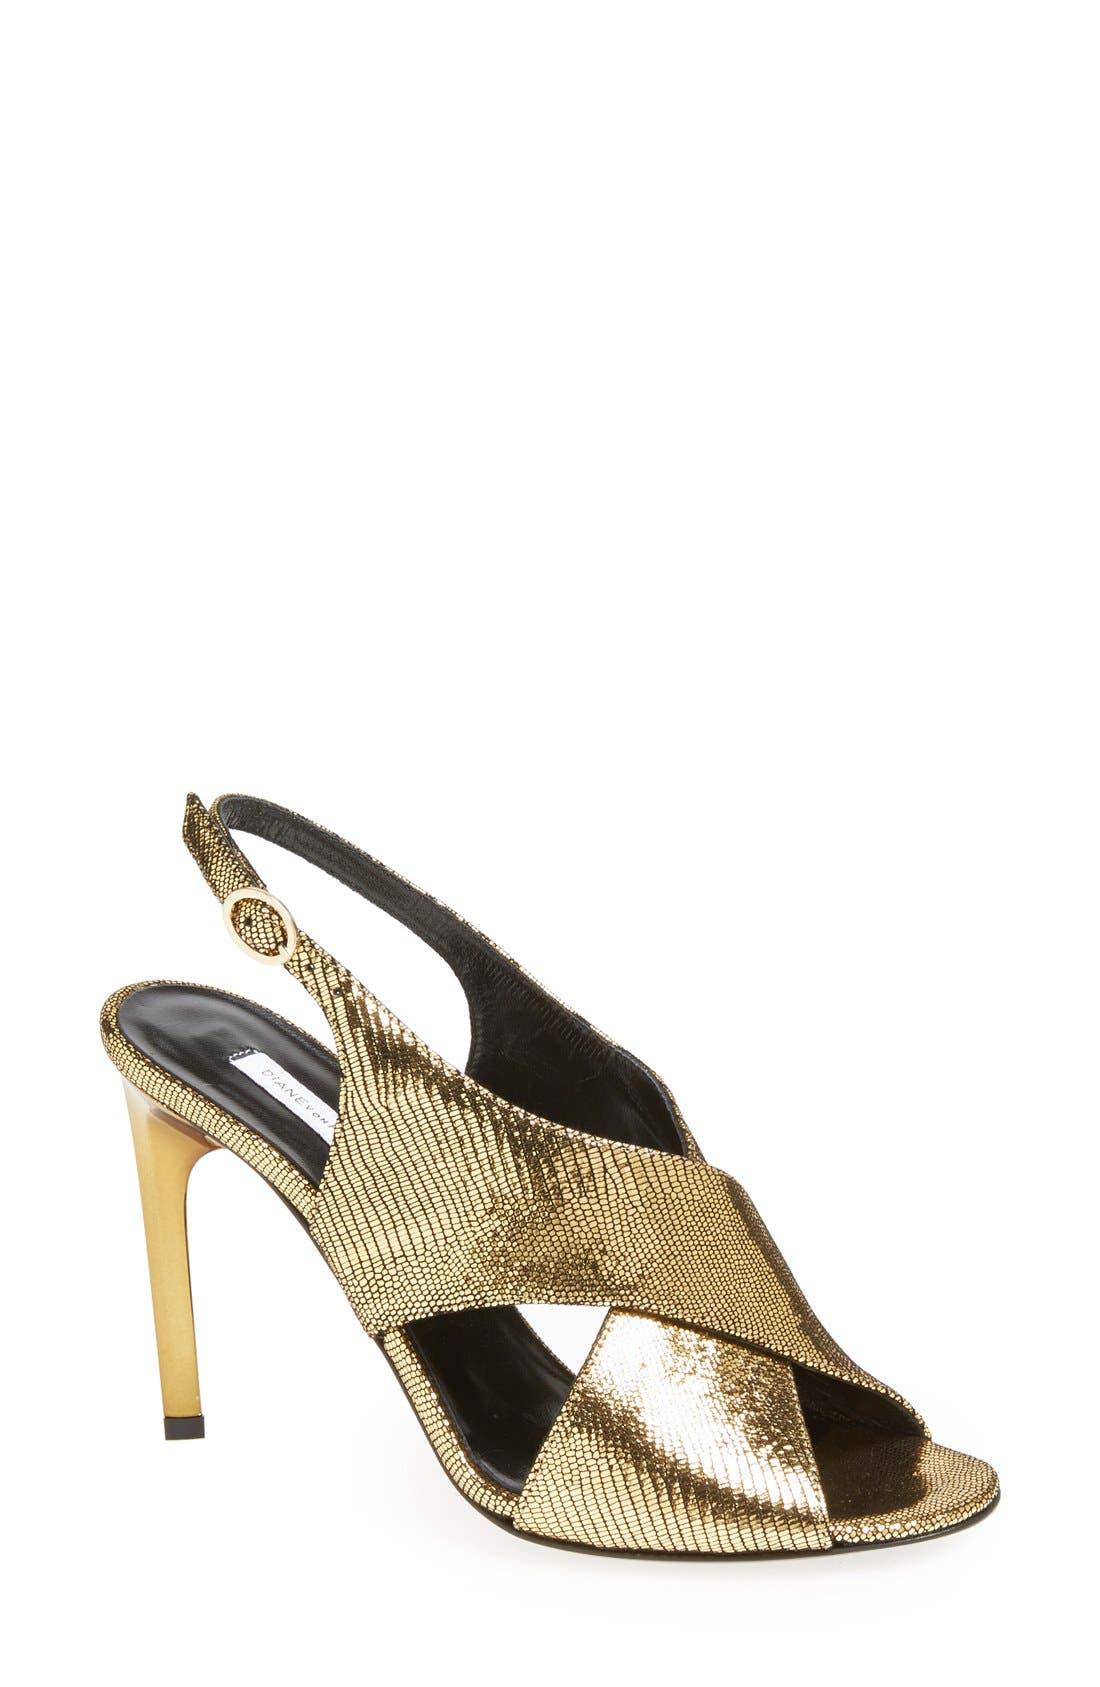 Main Image - Diane von Furstenberg 'Vick' Sandal (Women)